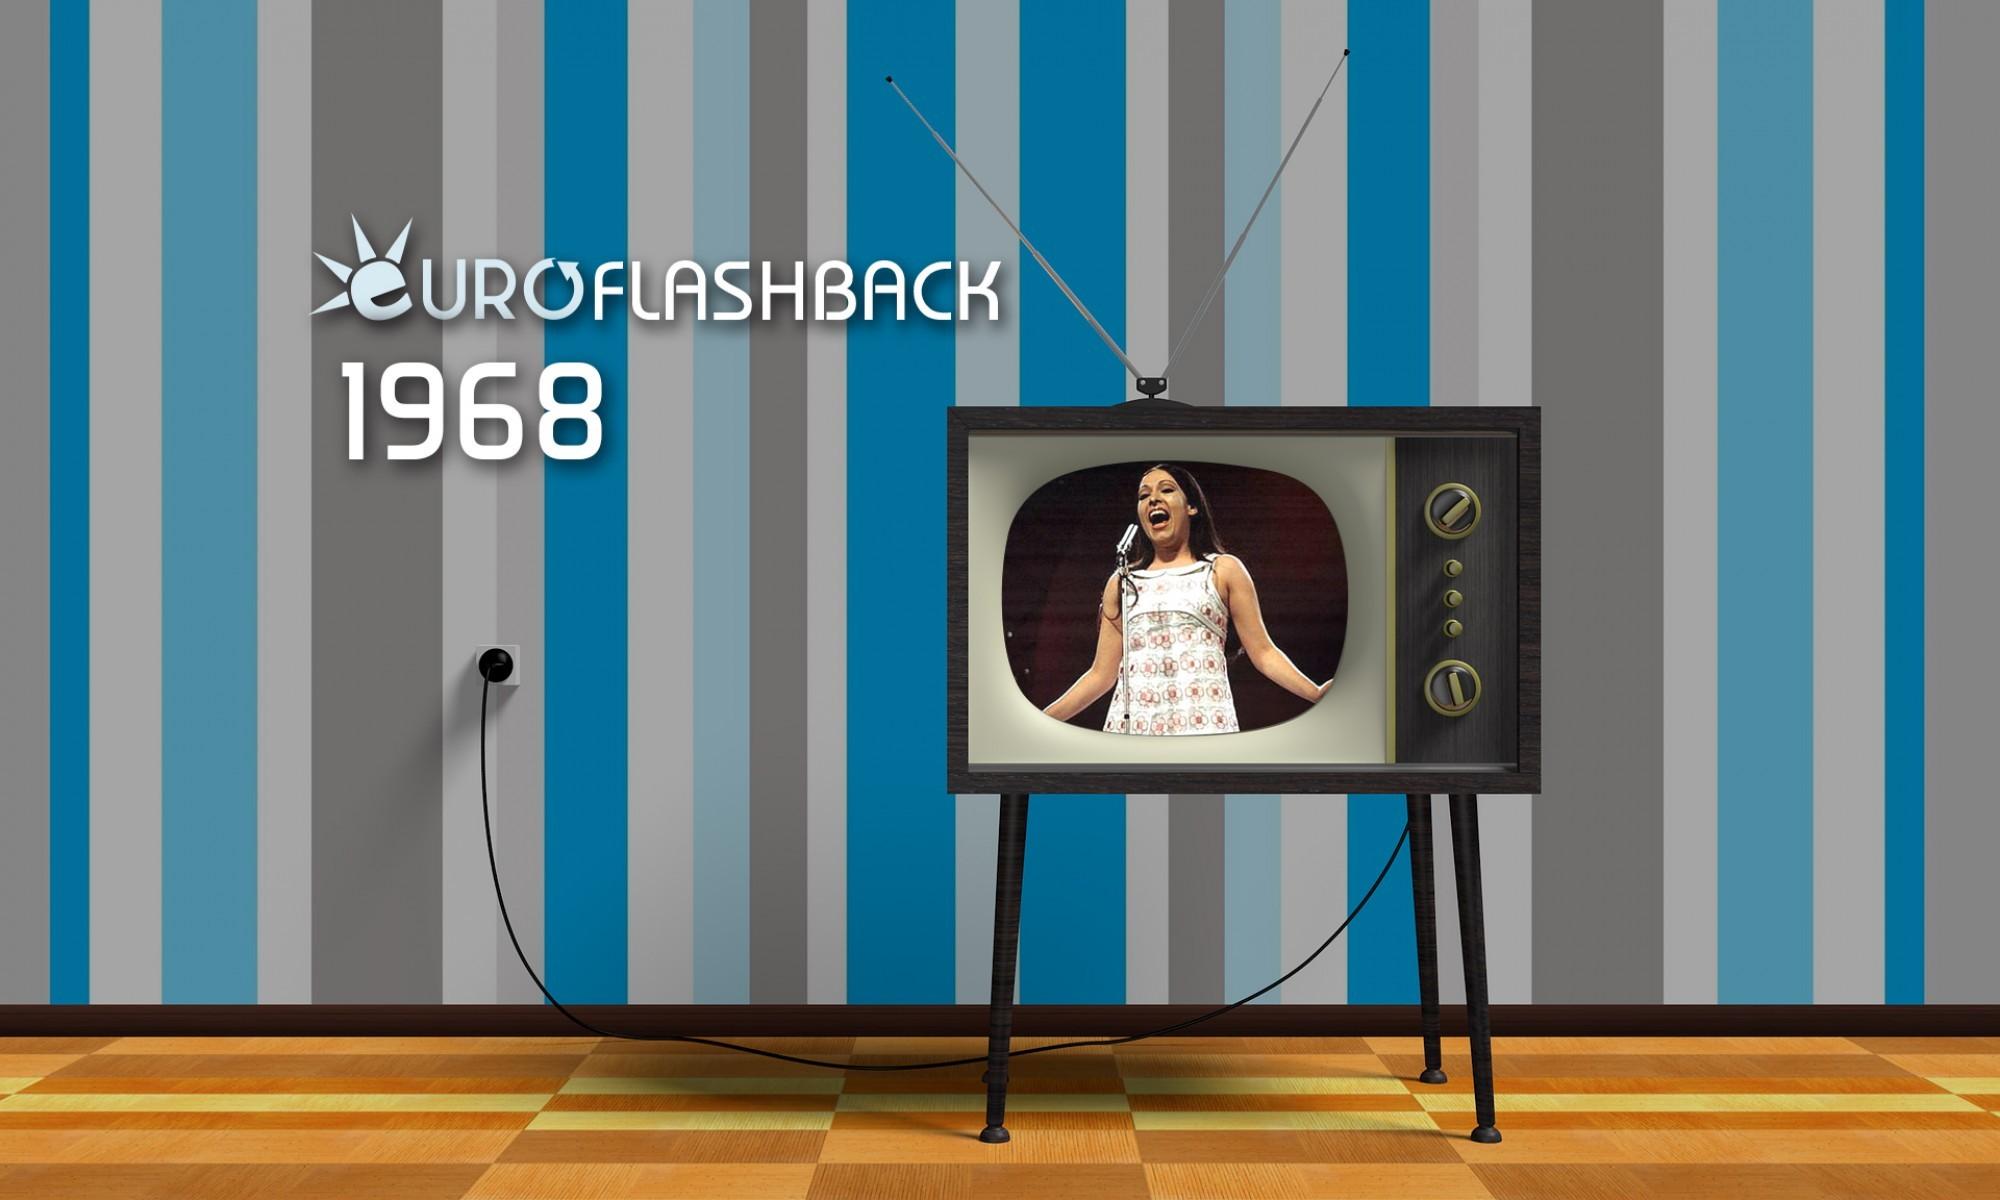 EUROFLASHBACK 1968 parentesis1parentesis grande